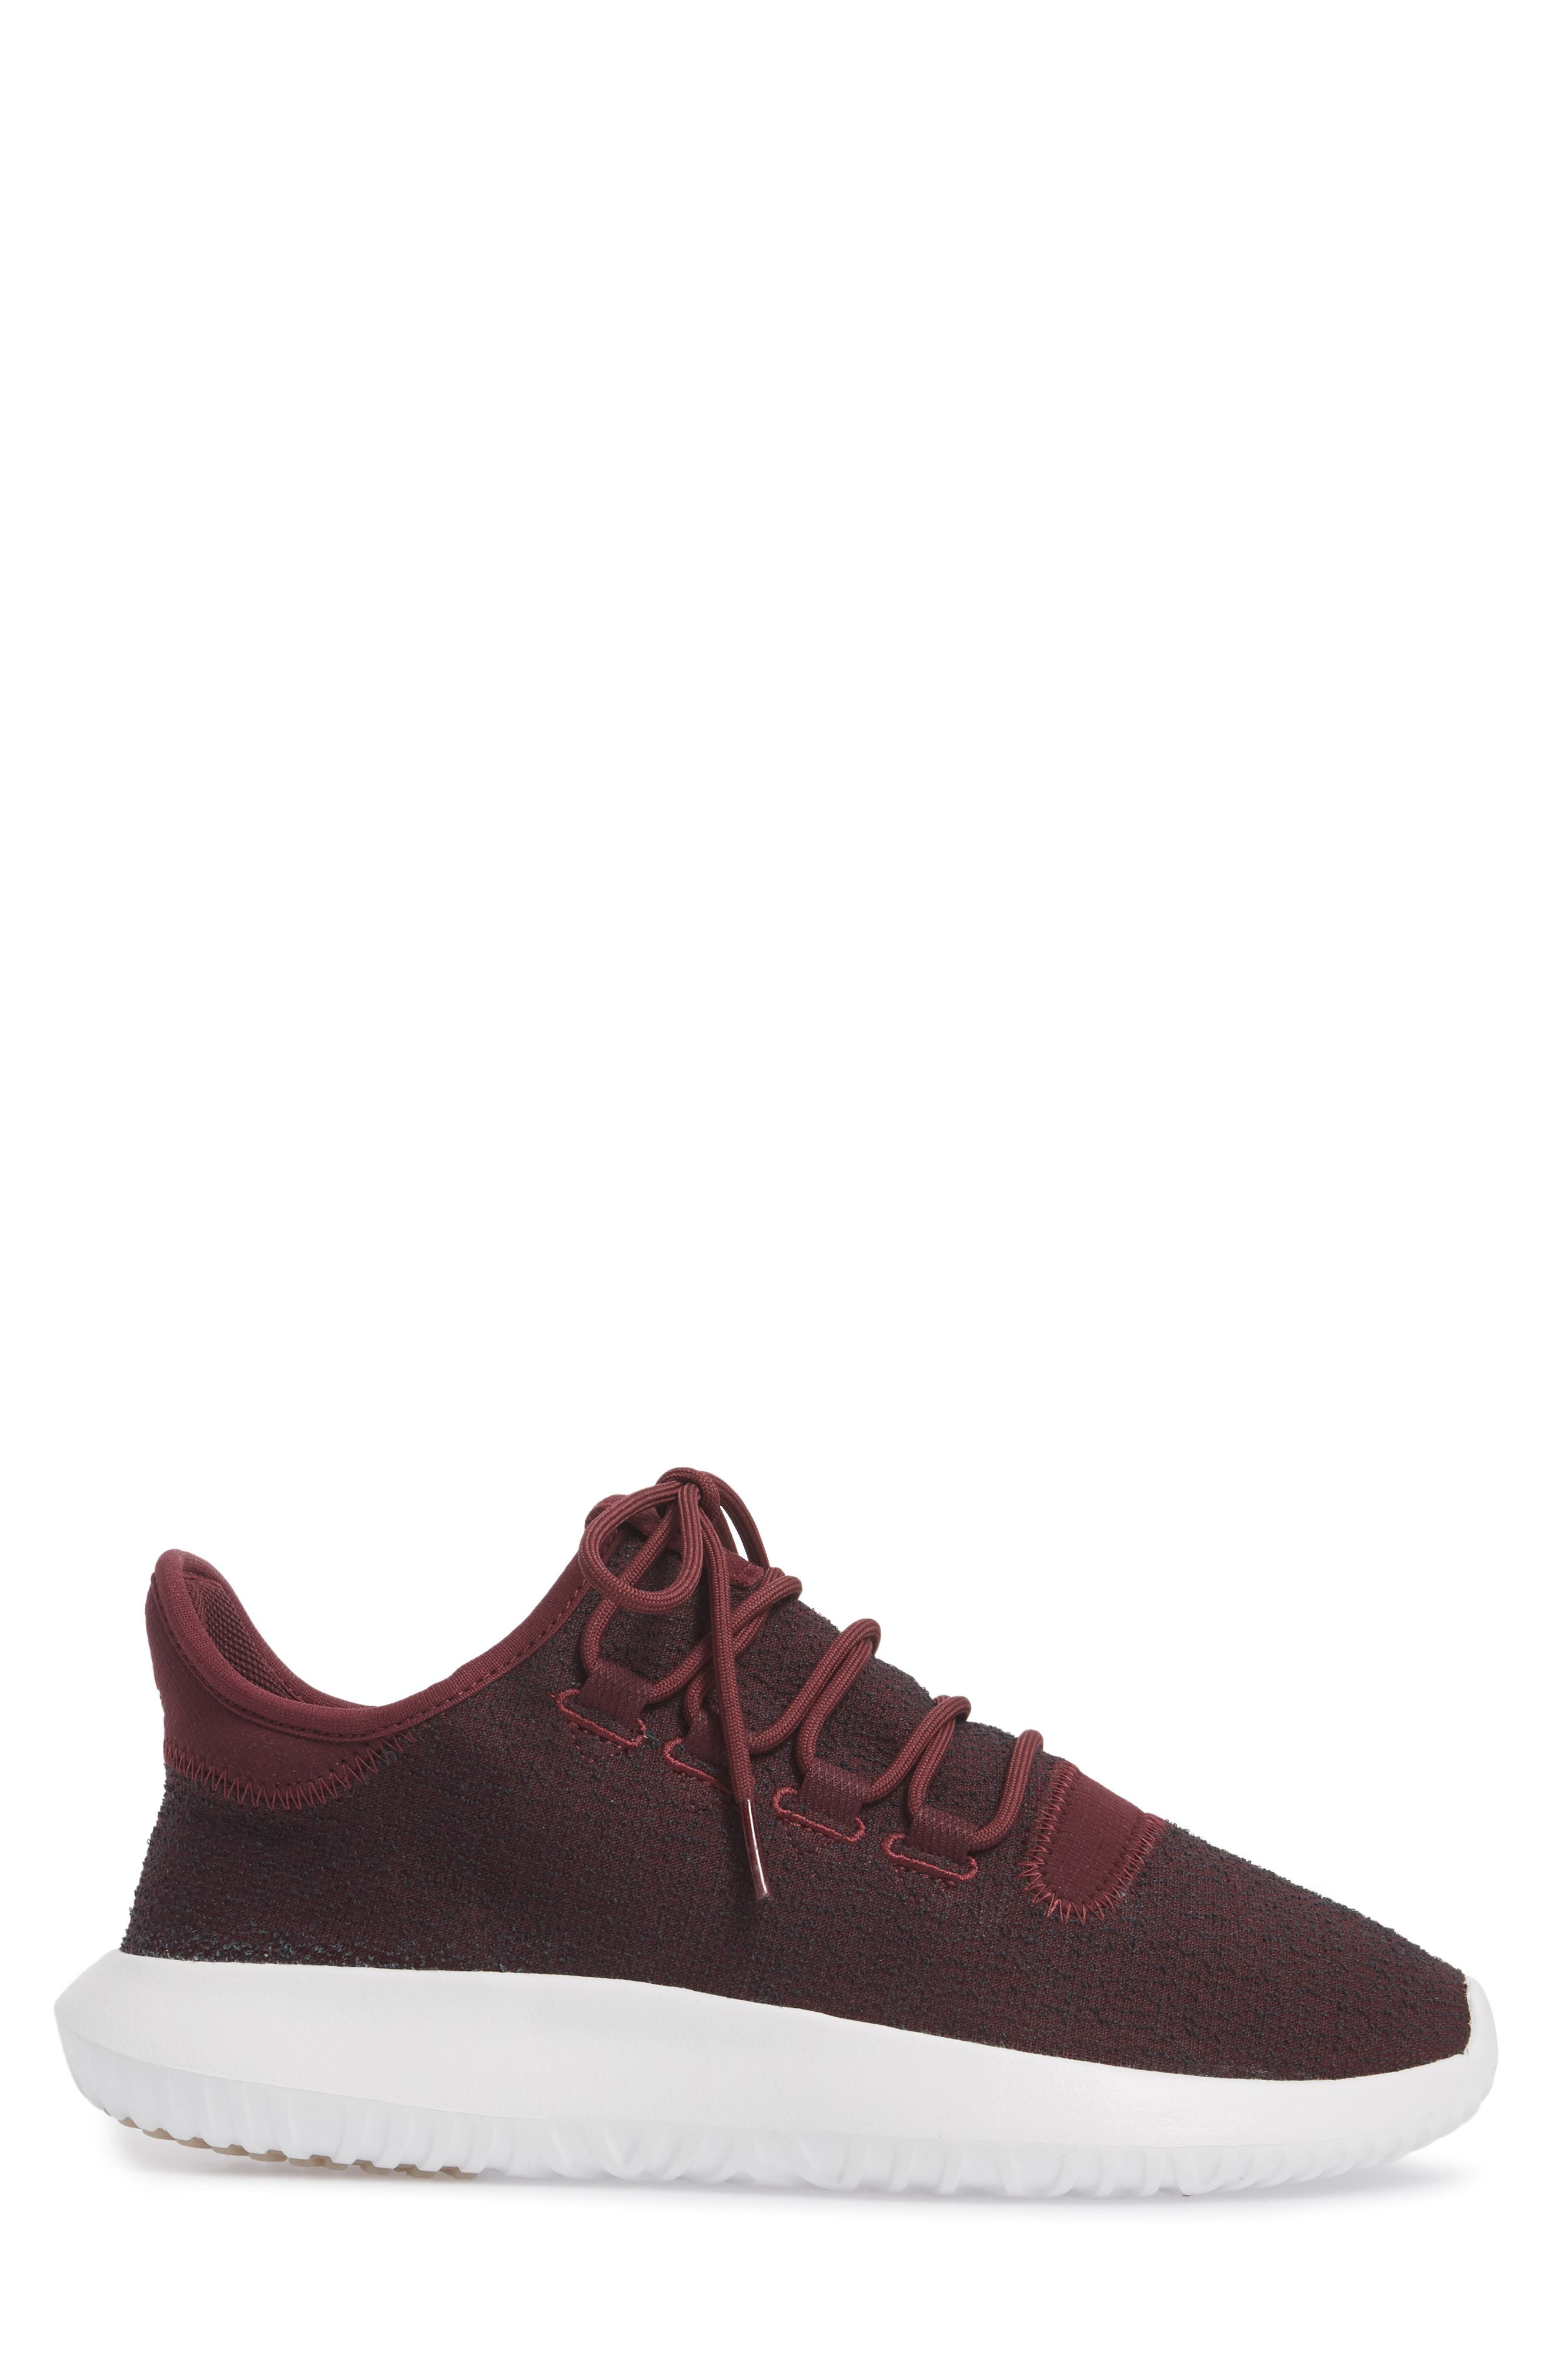 Tubular Shadow Sneaker,                             Alternate thumbnail 12, color,